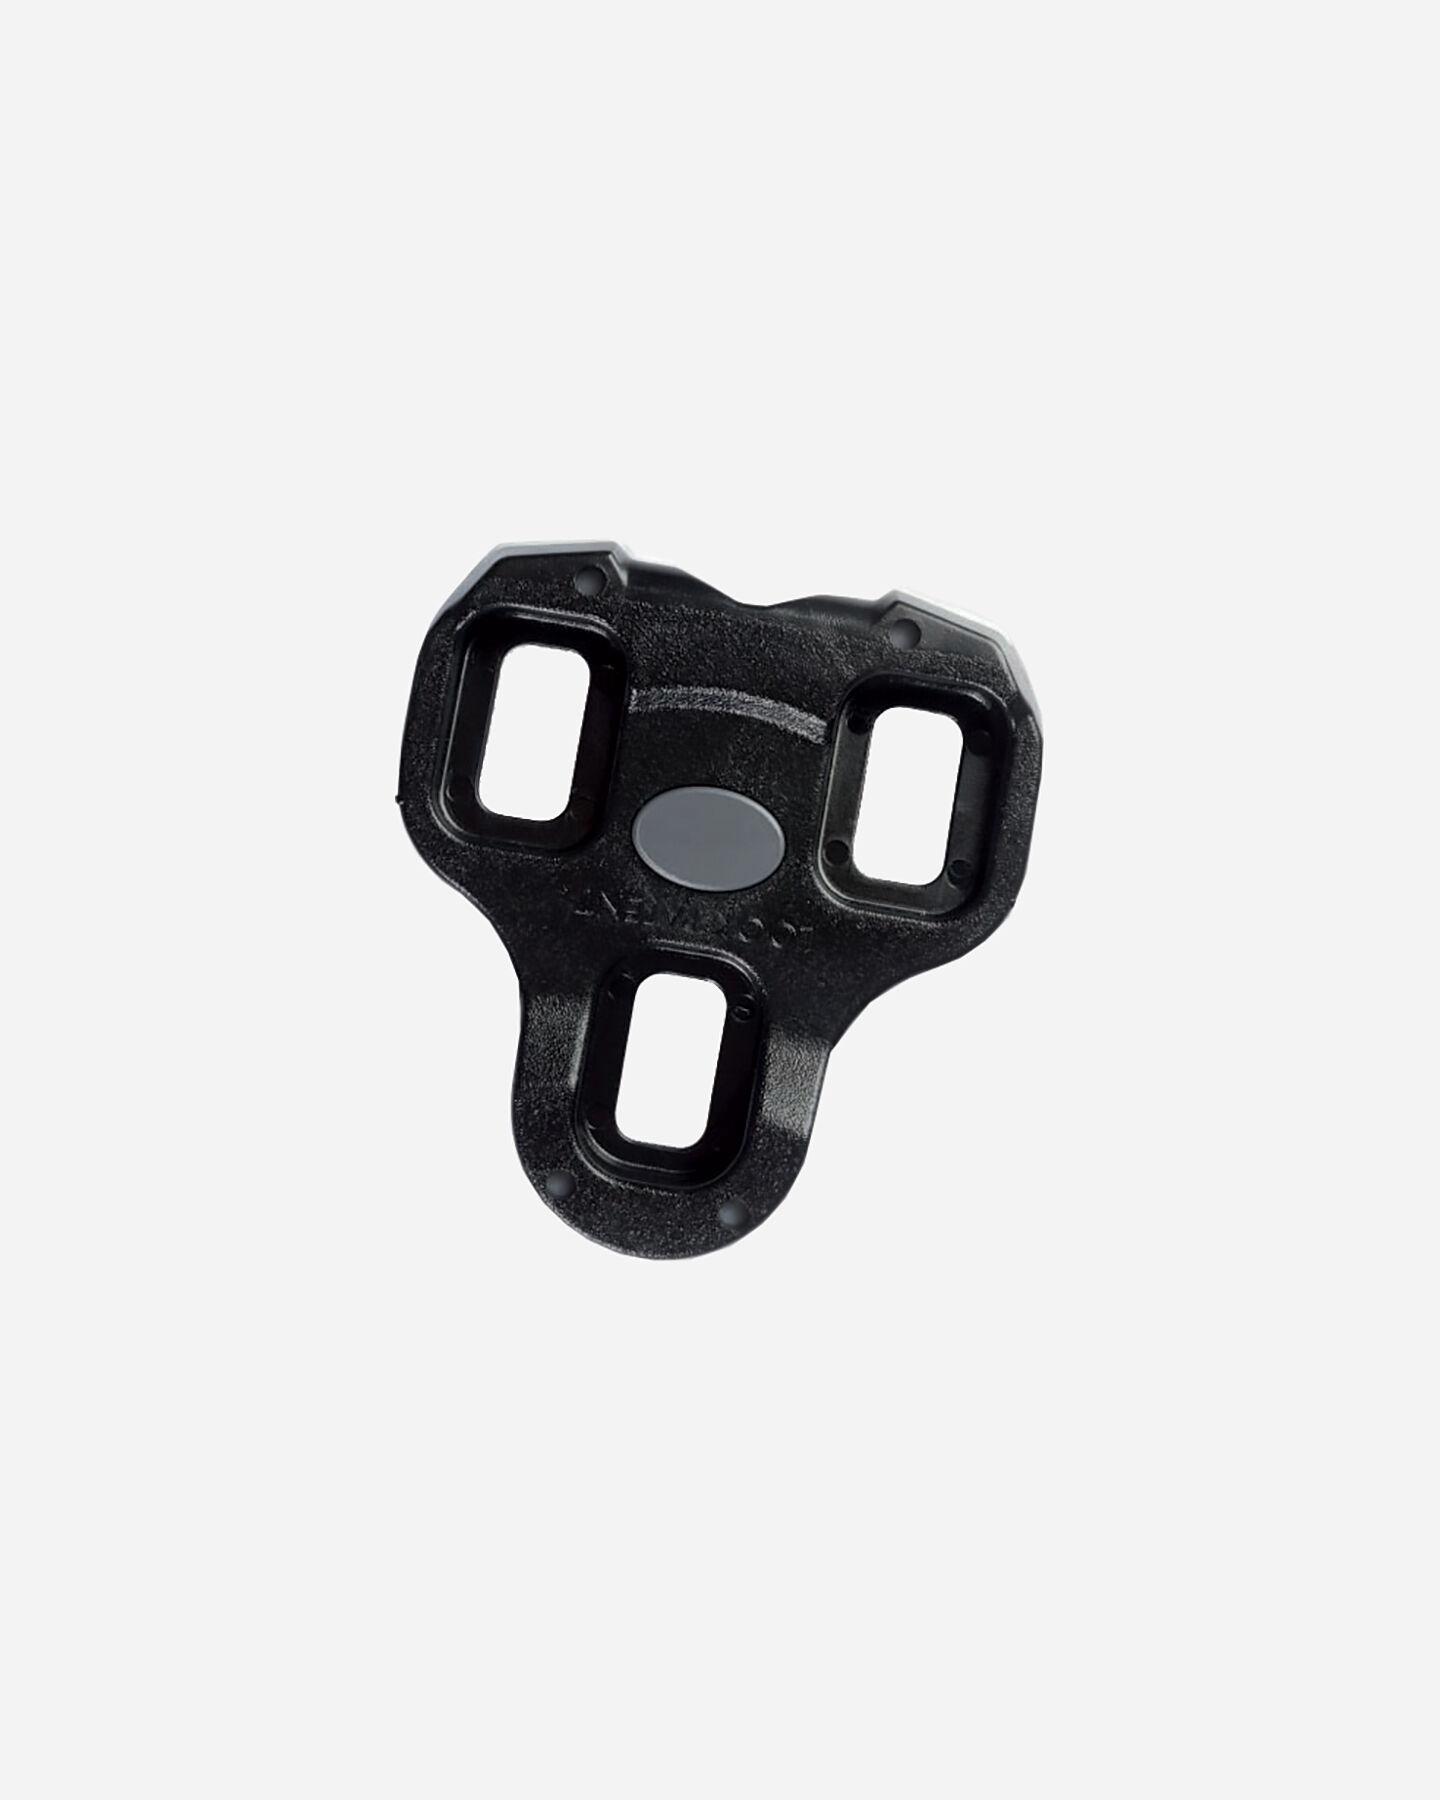 Pedali BONIN LOOK KEO CLEAT  S1259970|1|UNI scatto 2